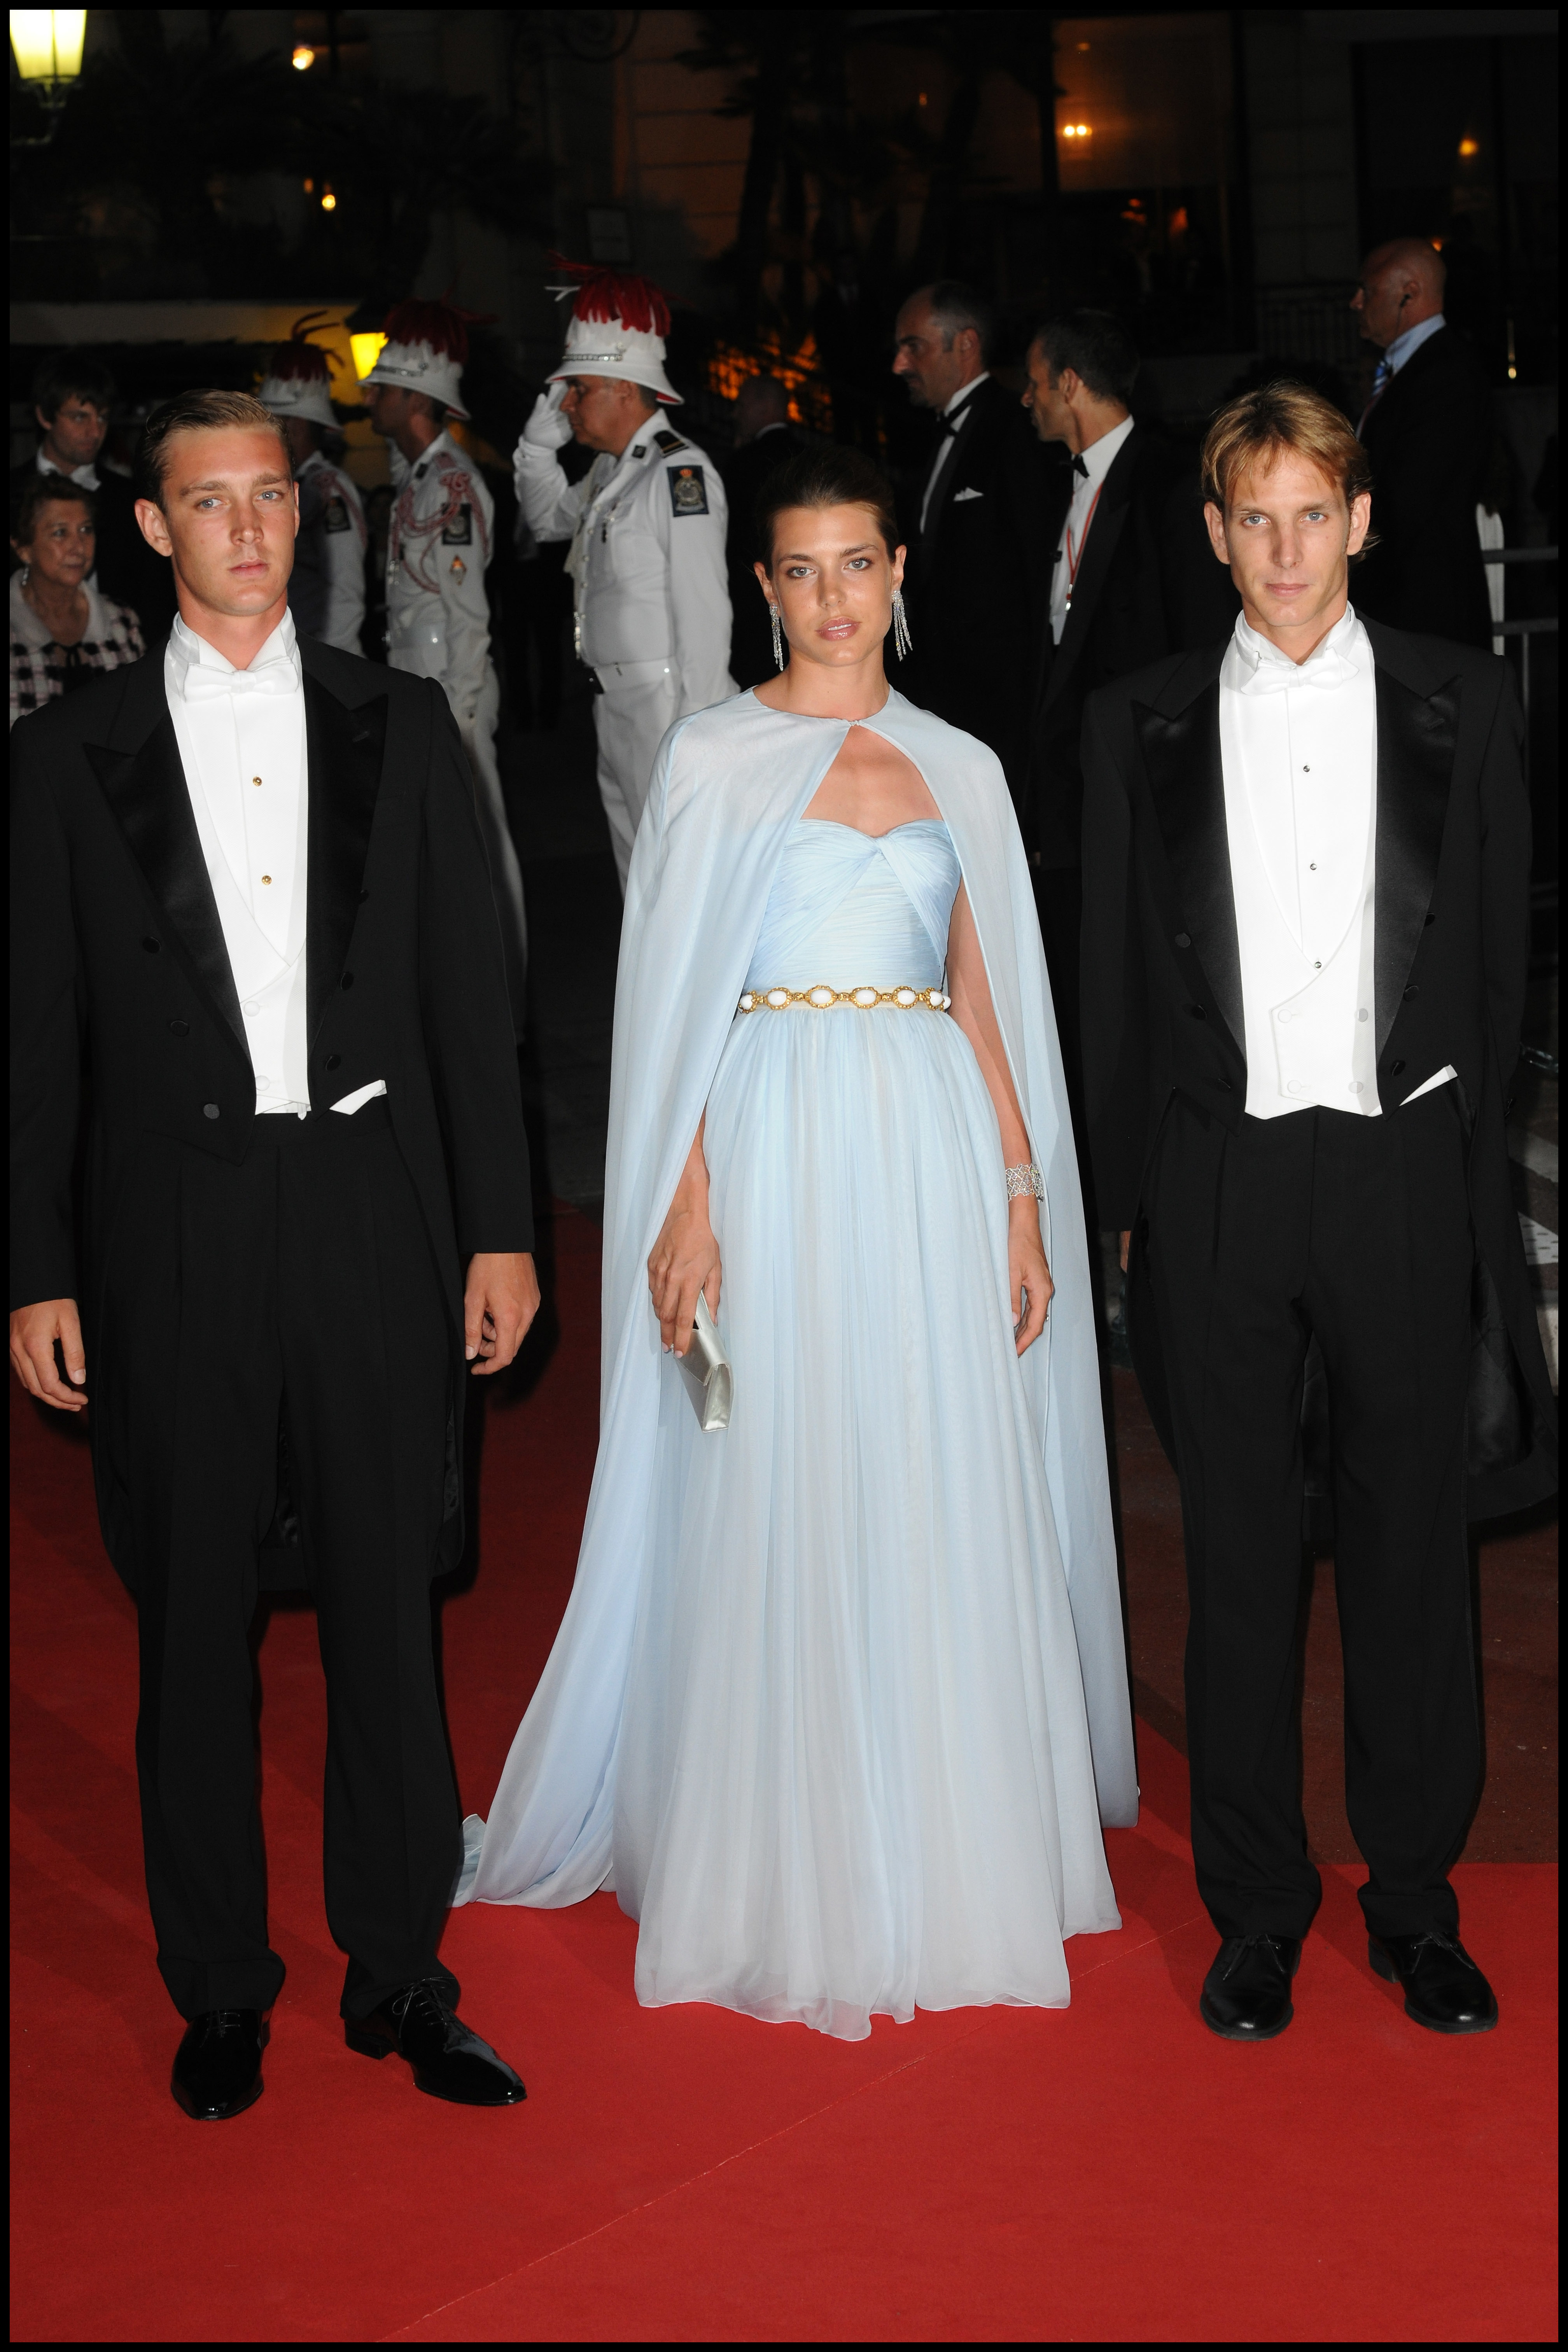 Charlotte Monaco, royals, realeza